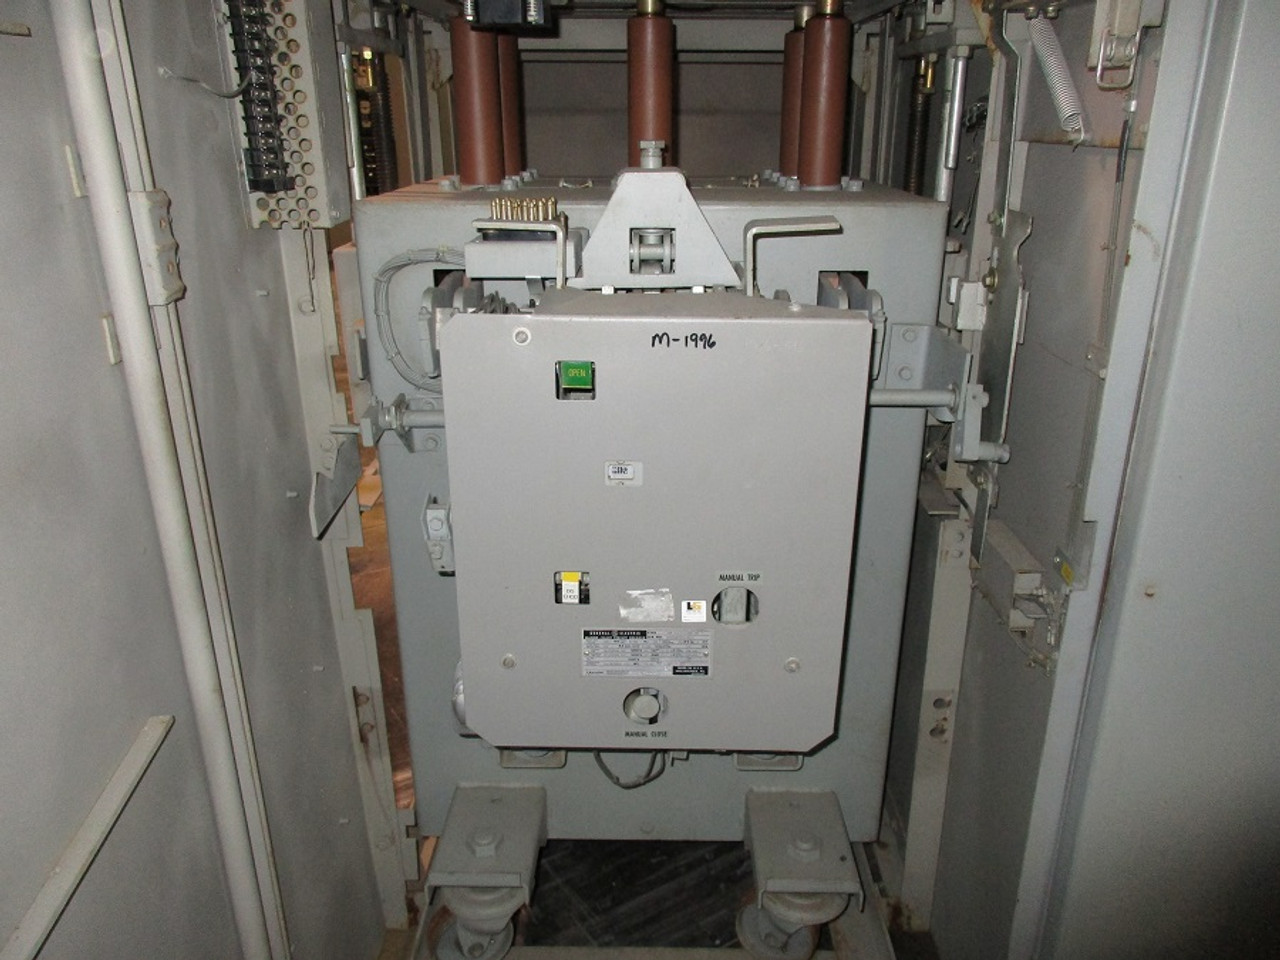 AM-13.8-500-7H GE Magne-Blast 1200A 15KV Air Circuit Breaker (In Structure)  - Bullock Breakers | Ge Magnablast Circuit Breaker Wiring Diagram |  | Bullock Breakers